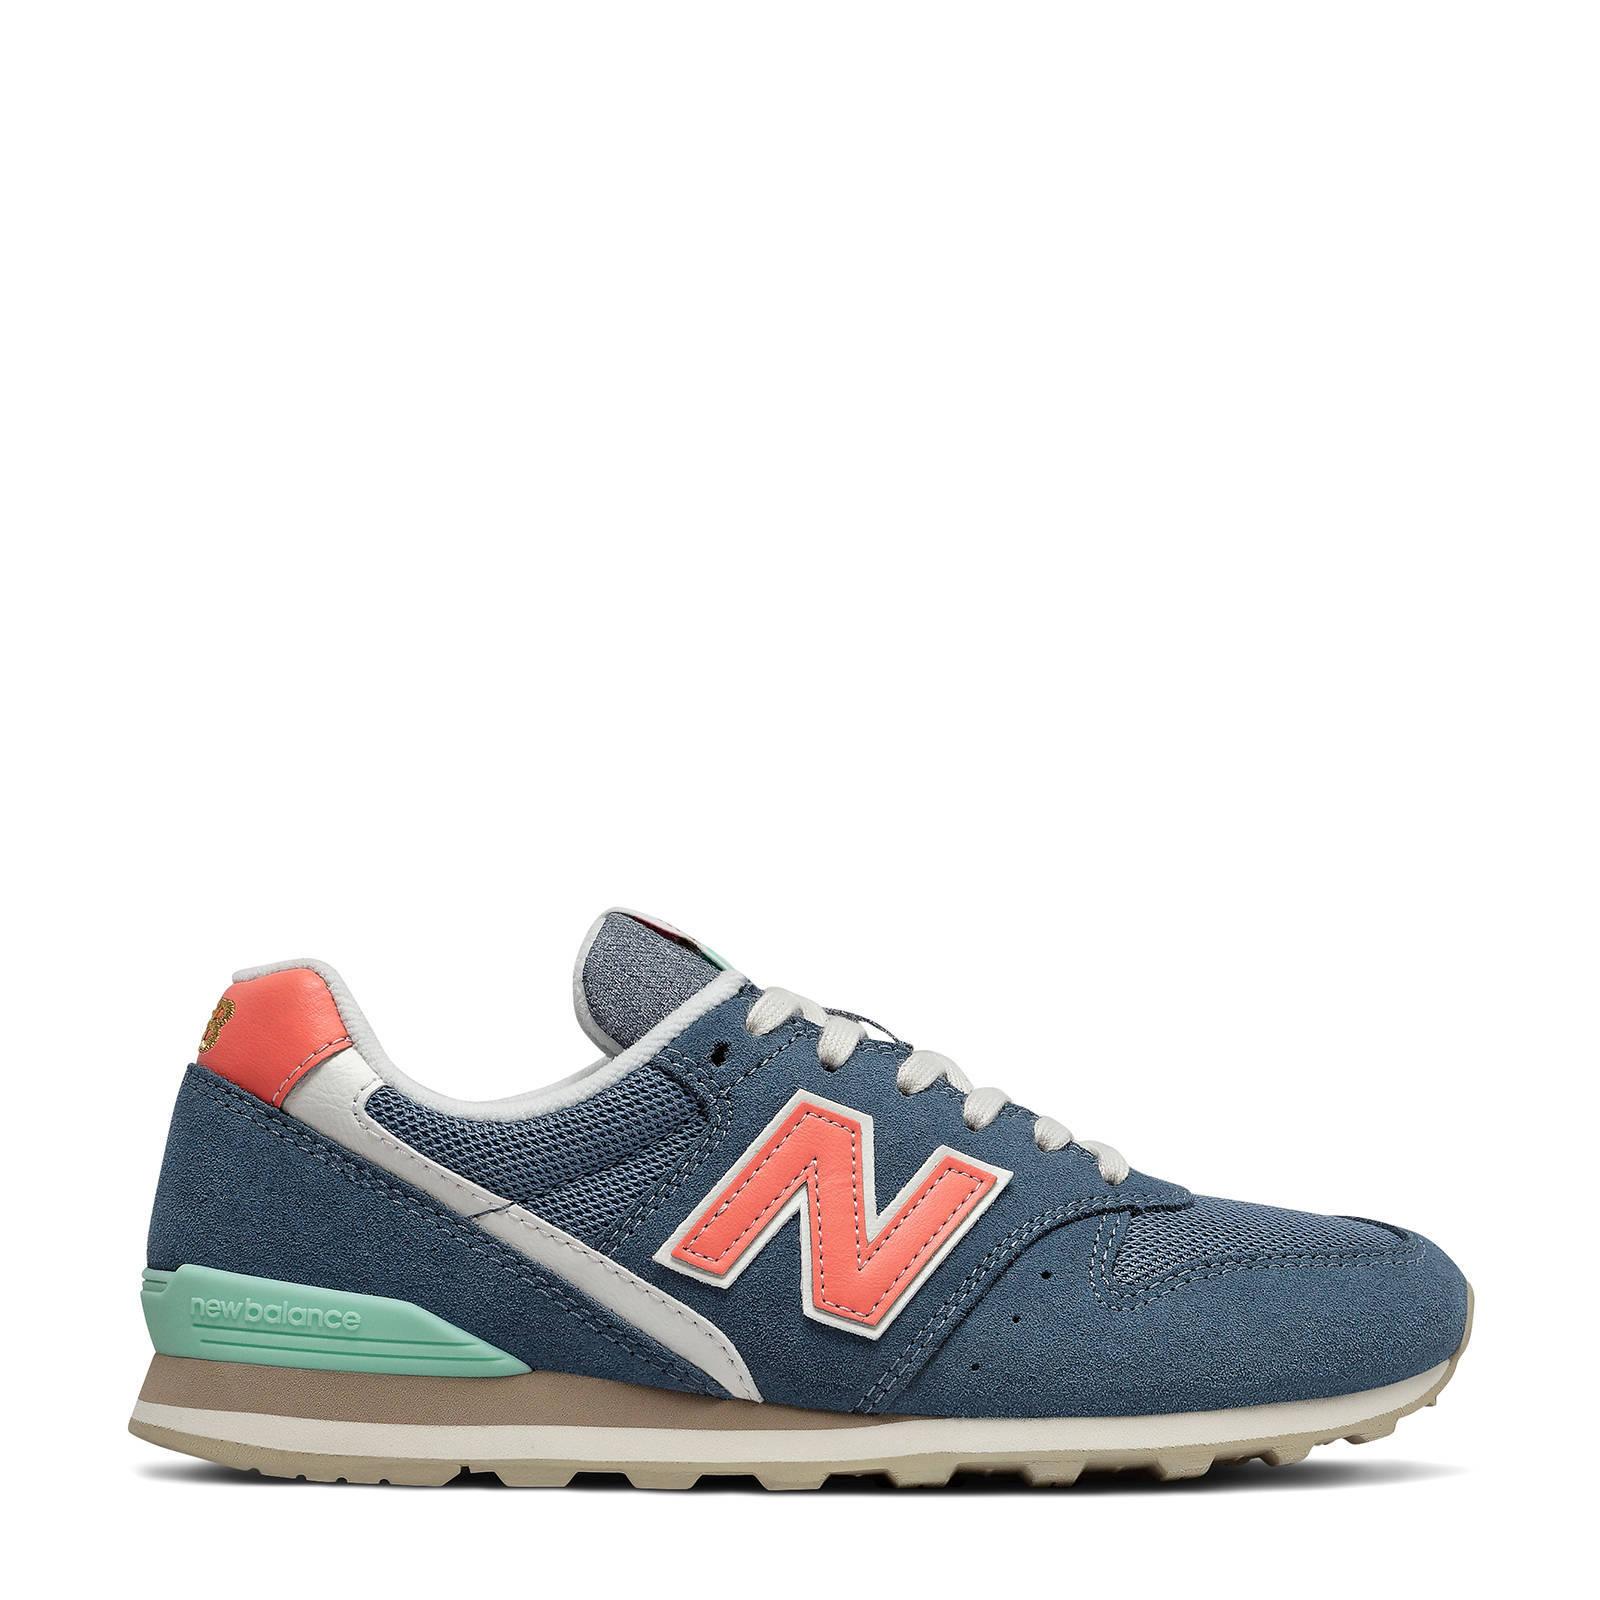 996 sneakers petrol/zalm